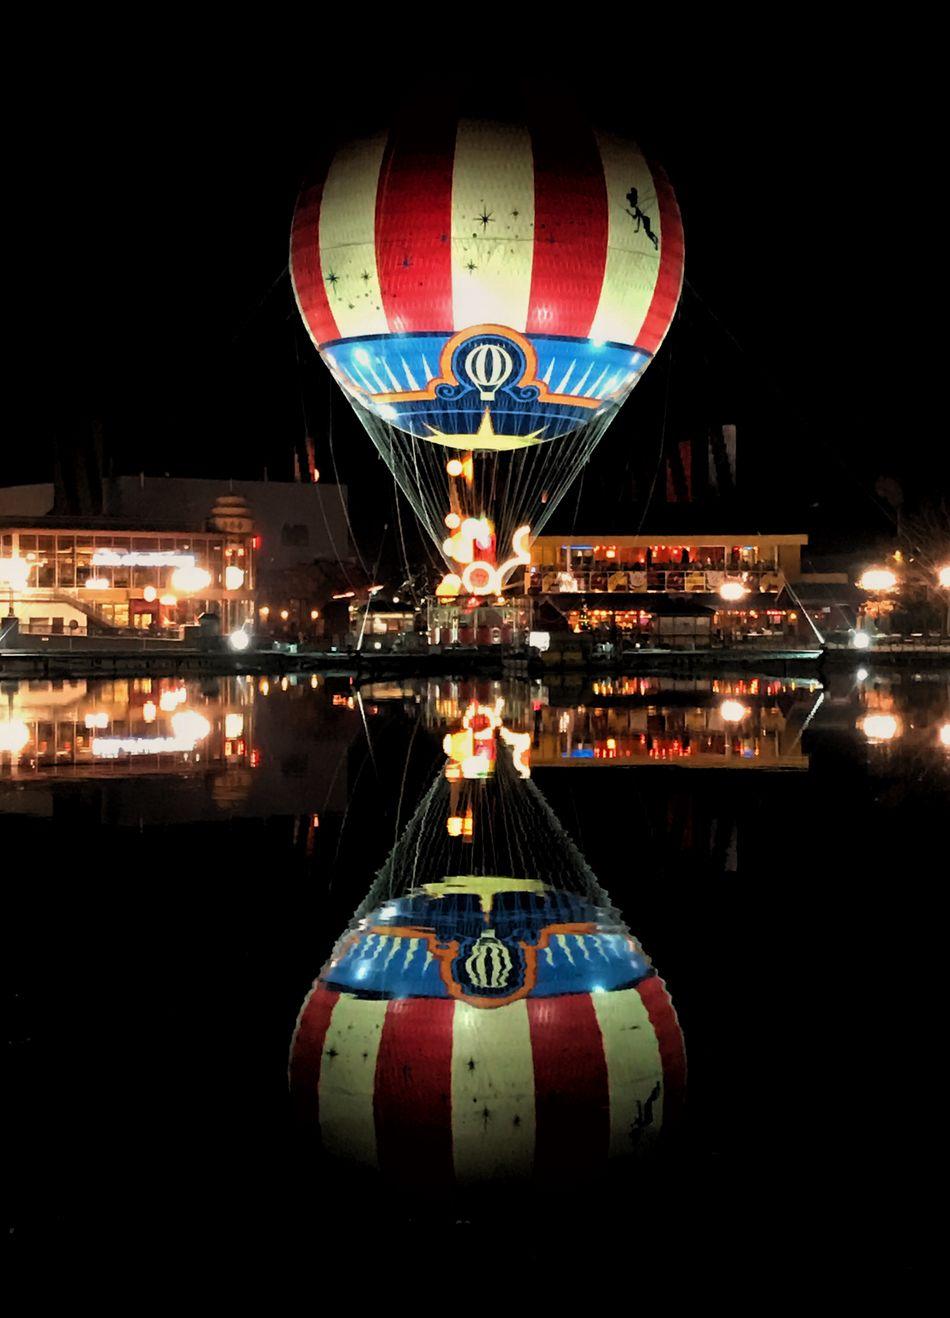 Air Ballloon At Night Balloon Disney Disneyland Disneyland Paris Disneyland Resort Paris Hot Air Balloon Reflection